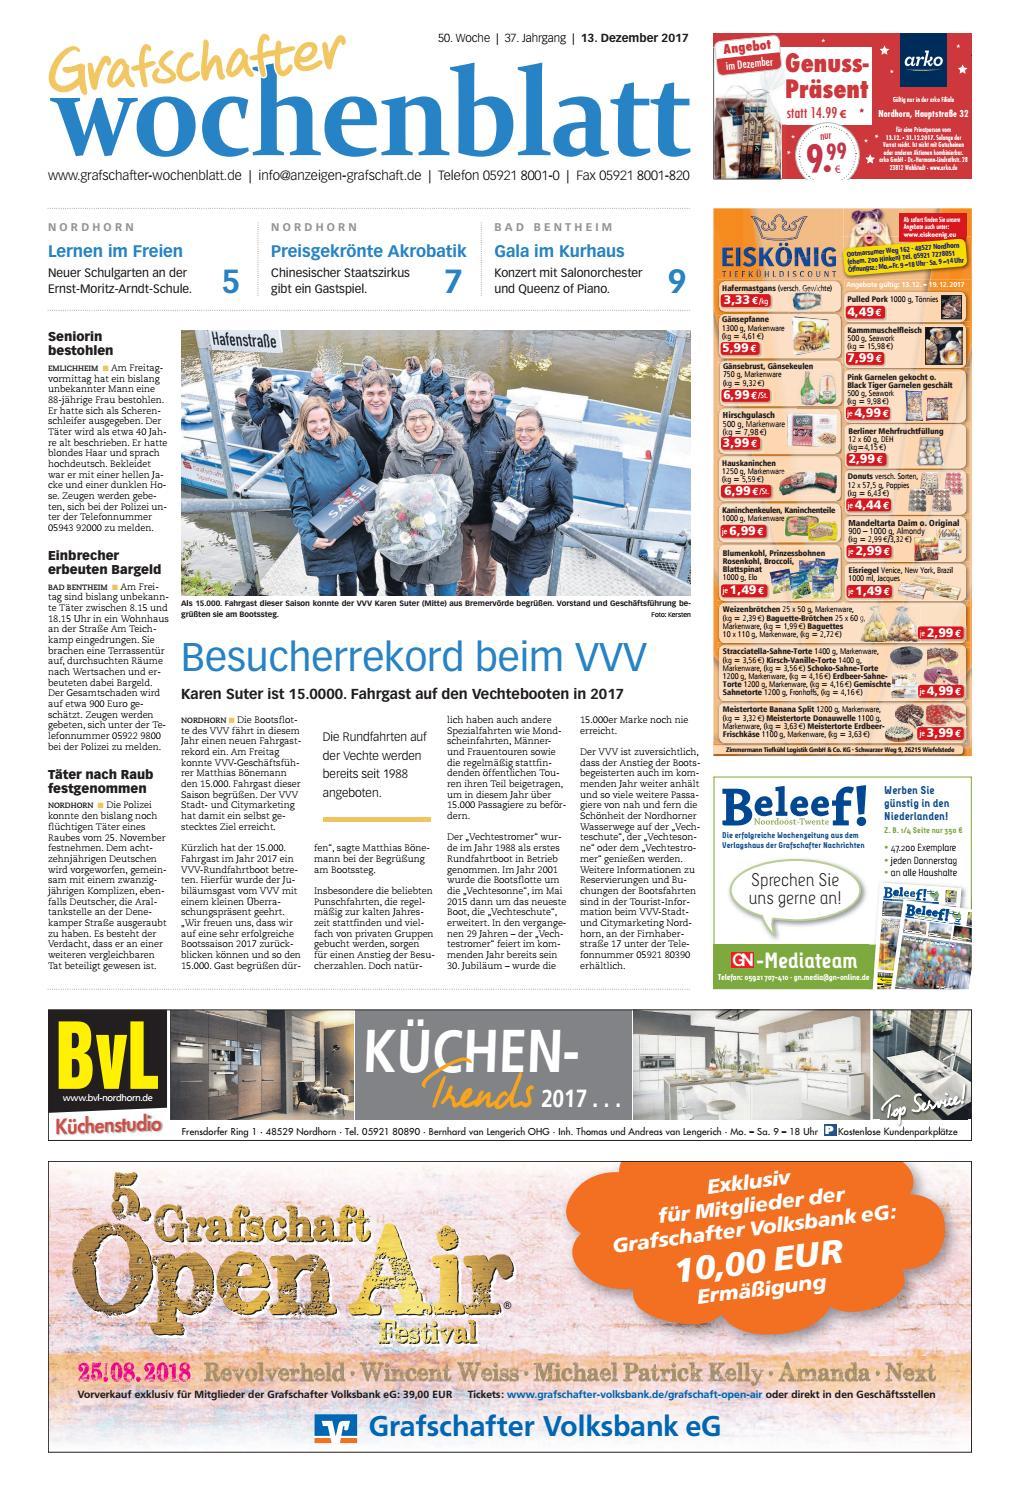 Grafschafter Wochenblatt_13-12-2017 by SonntagsZeitung - issuu